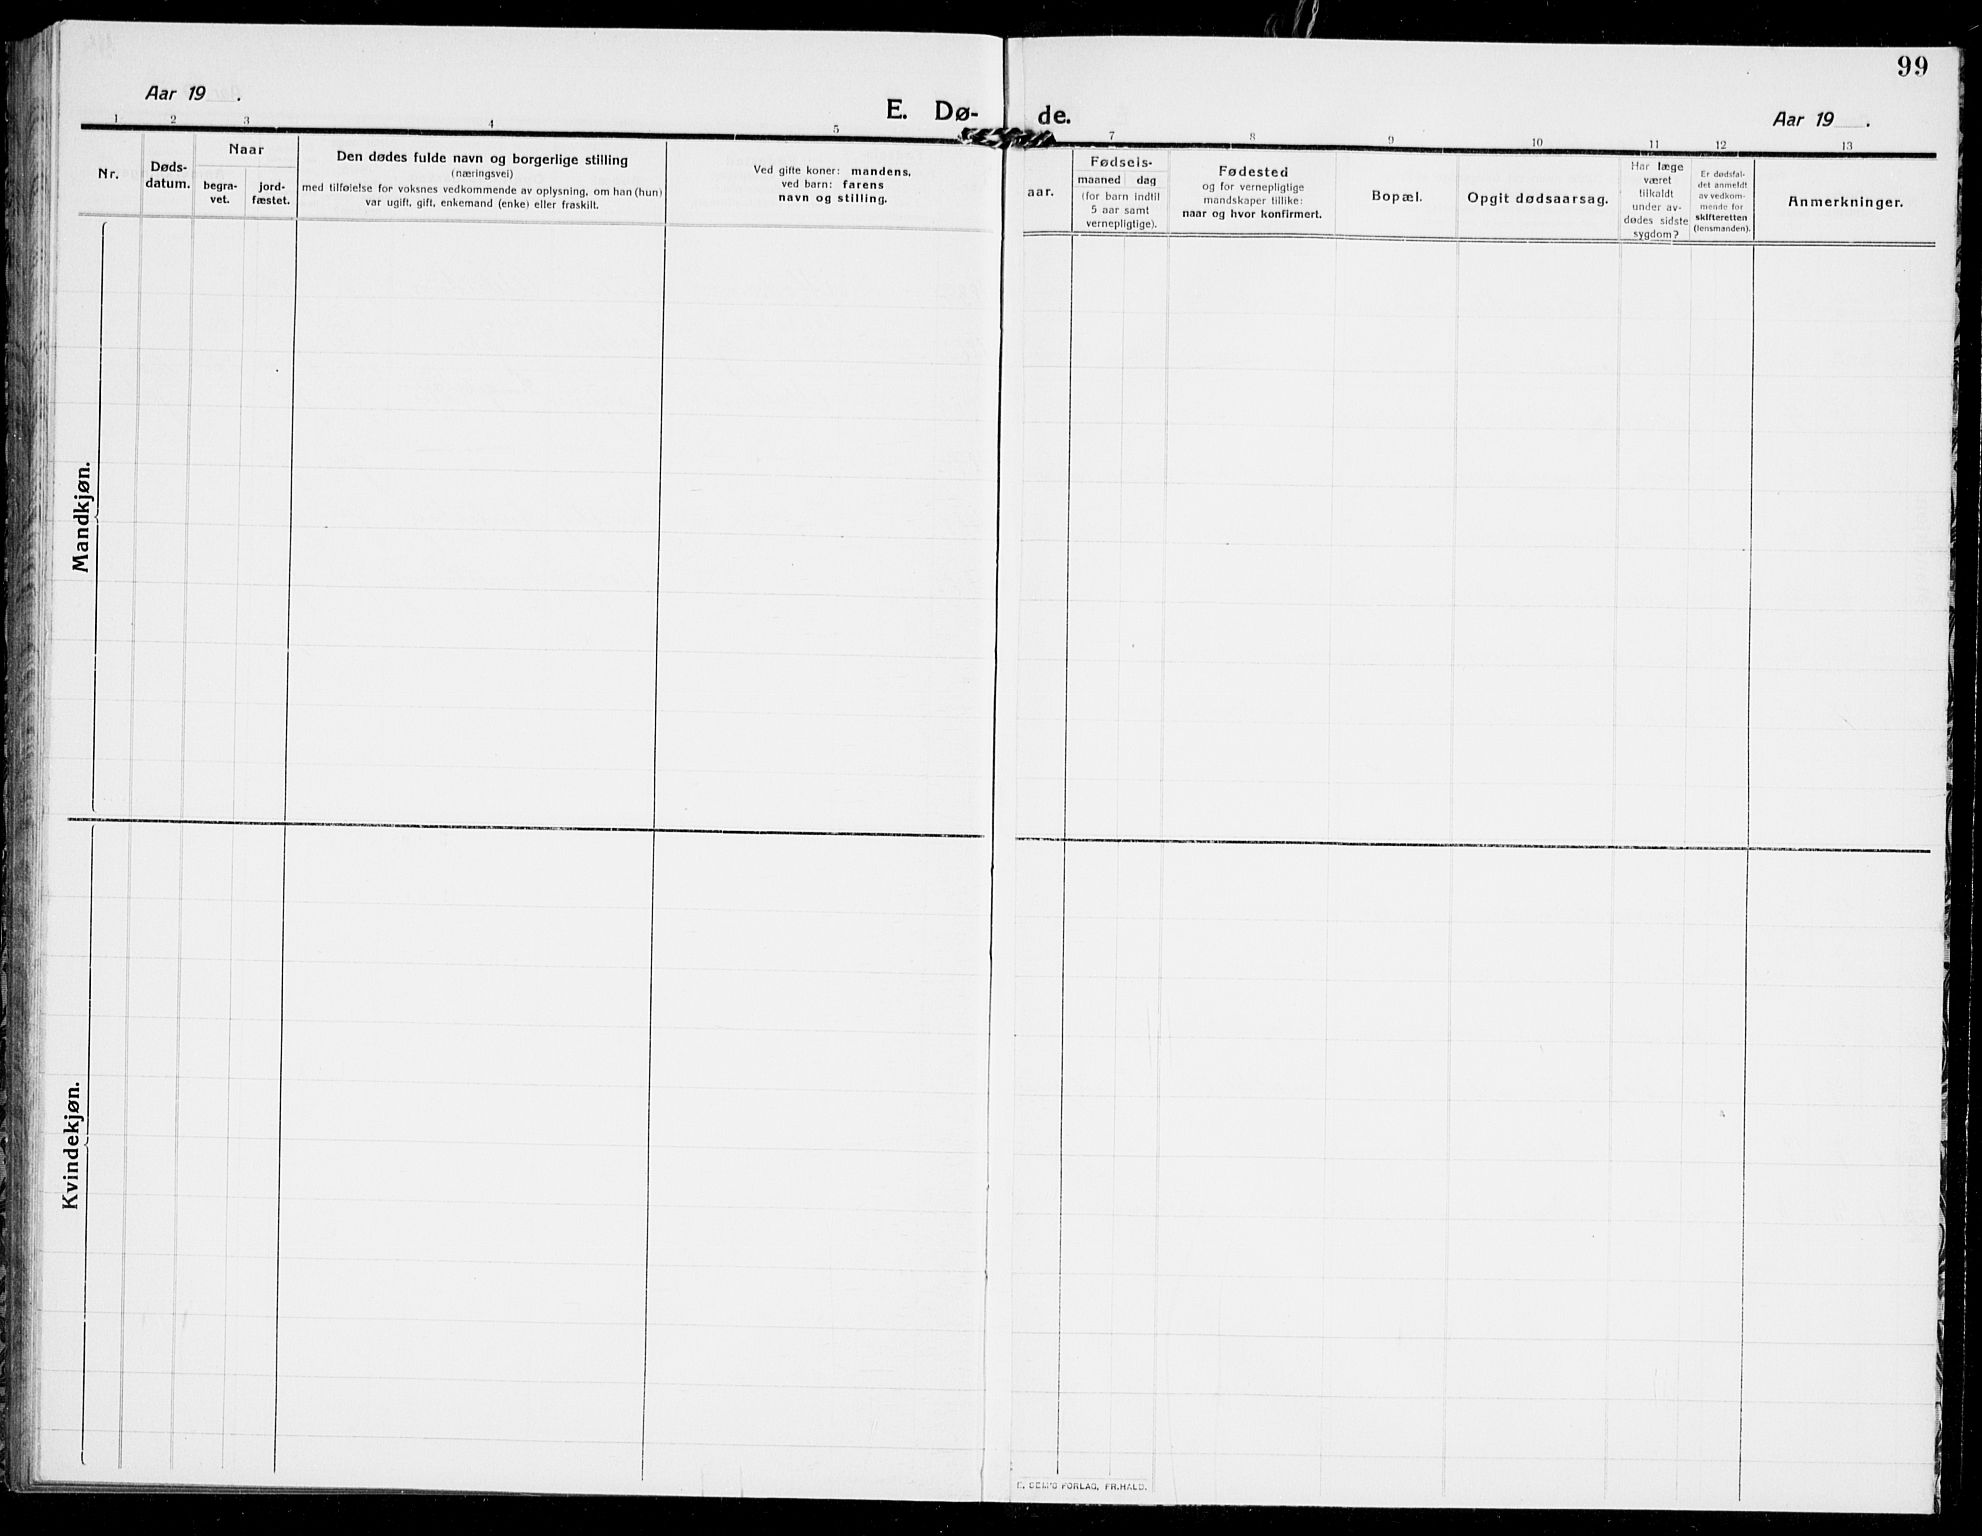 SAKO, Modum kirkebøker, G/Ga/L0011: Parish register (copy) no. I 11, 1910-1925, p. 99